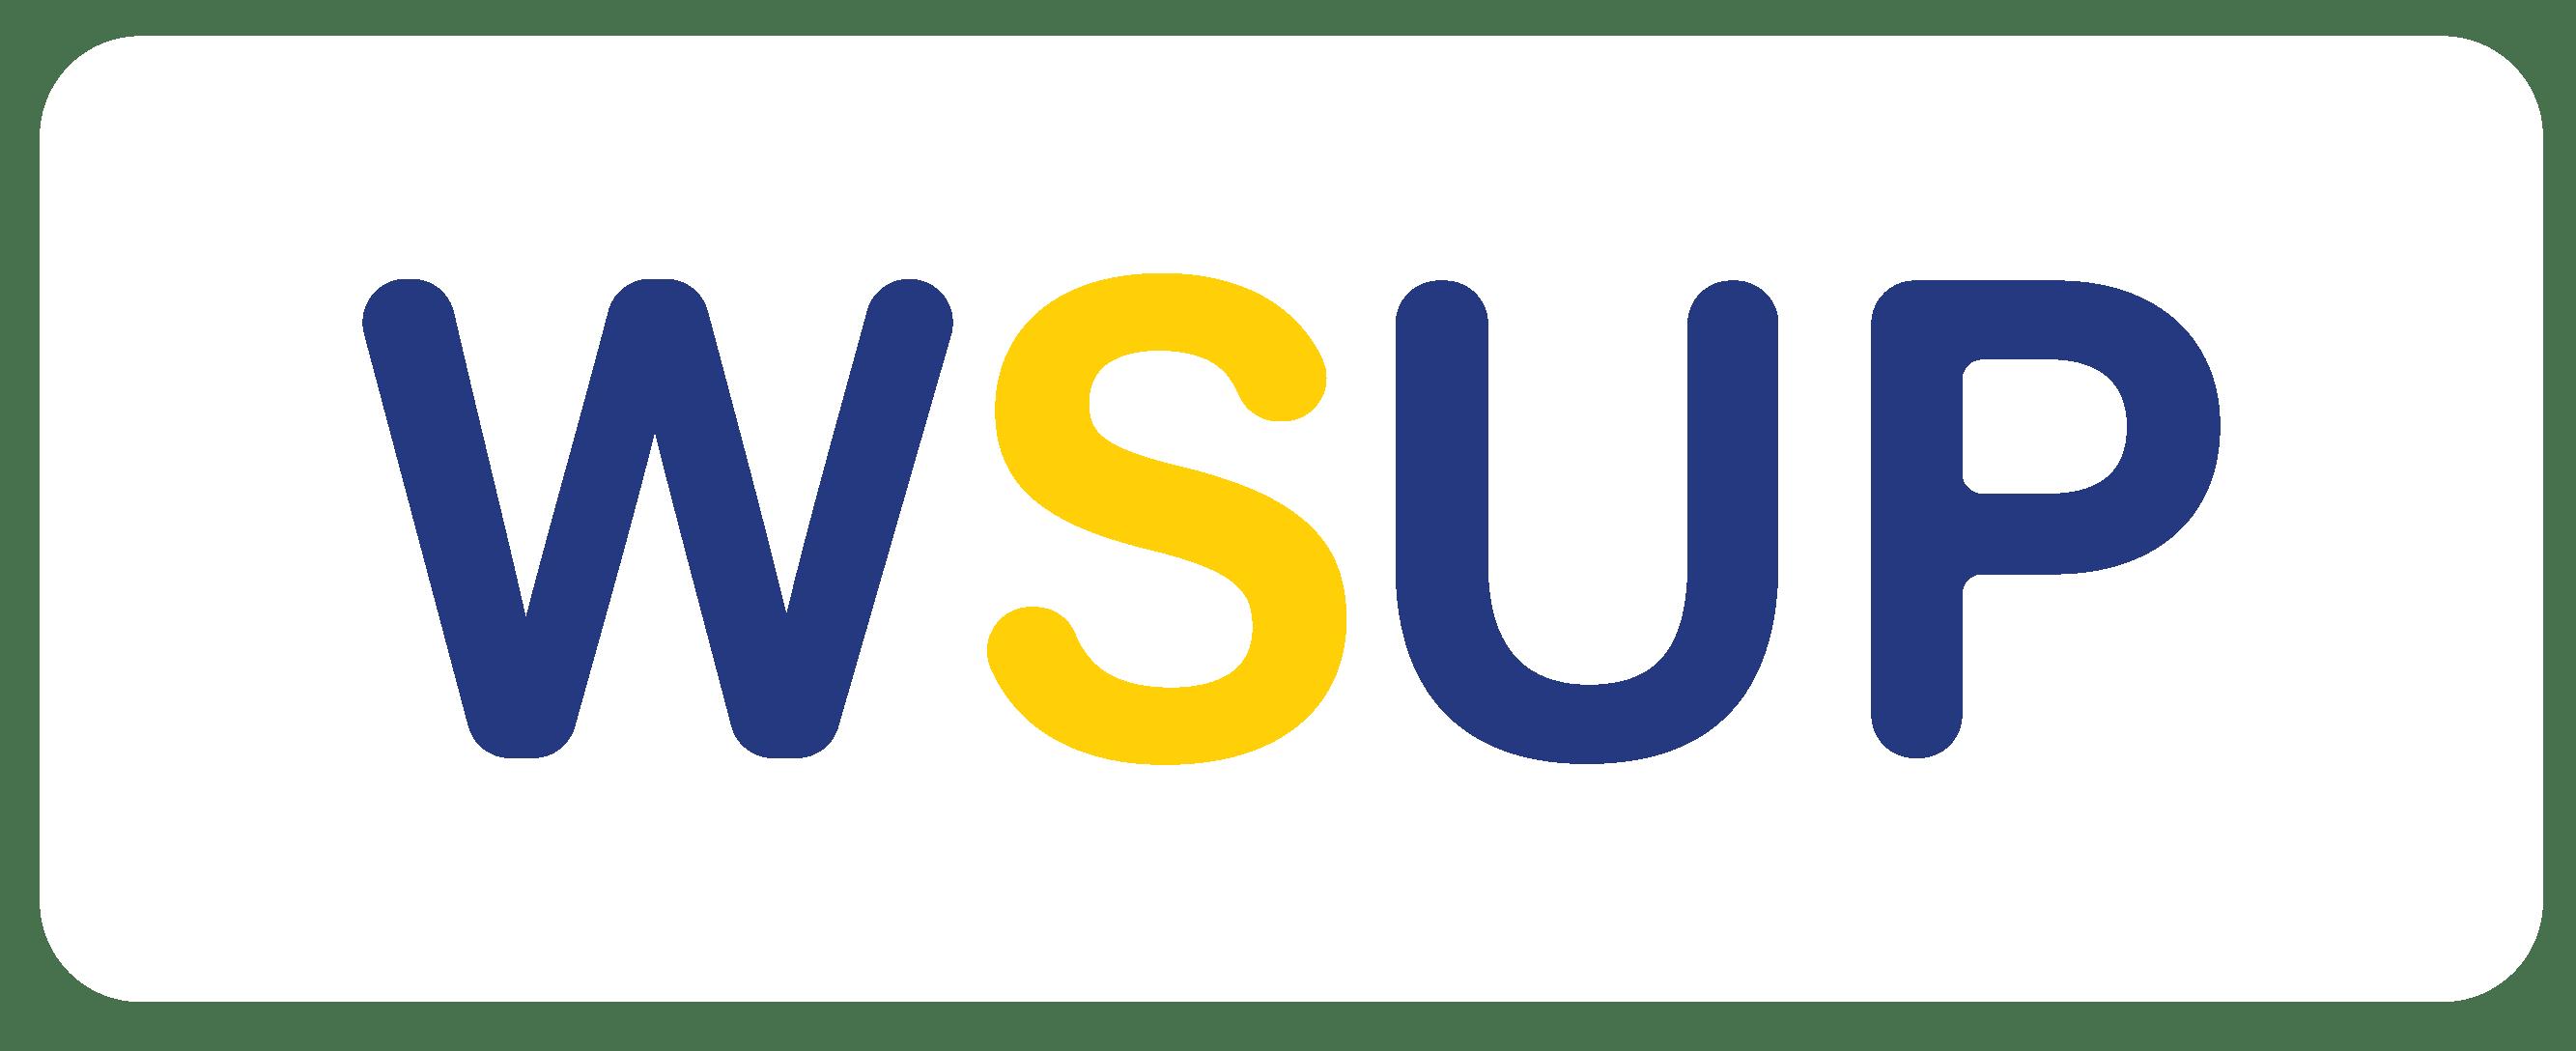 Woolwich WSUP Blue Logo